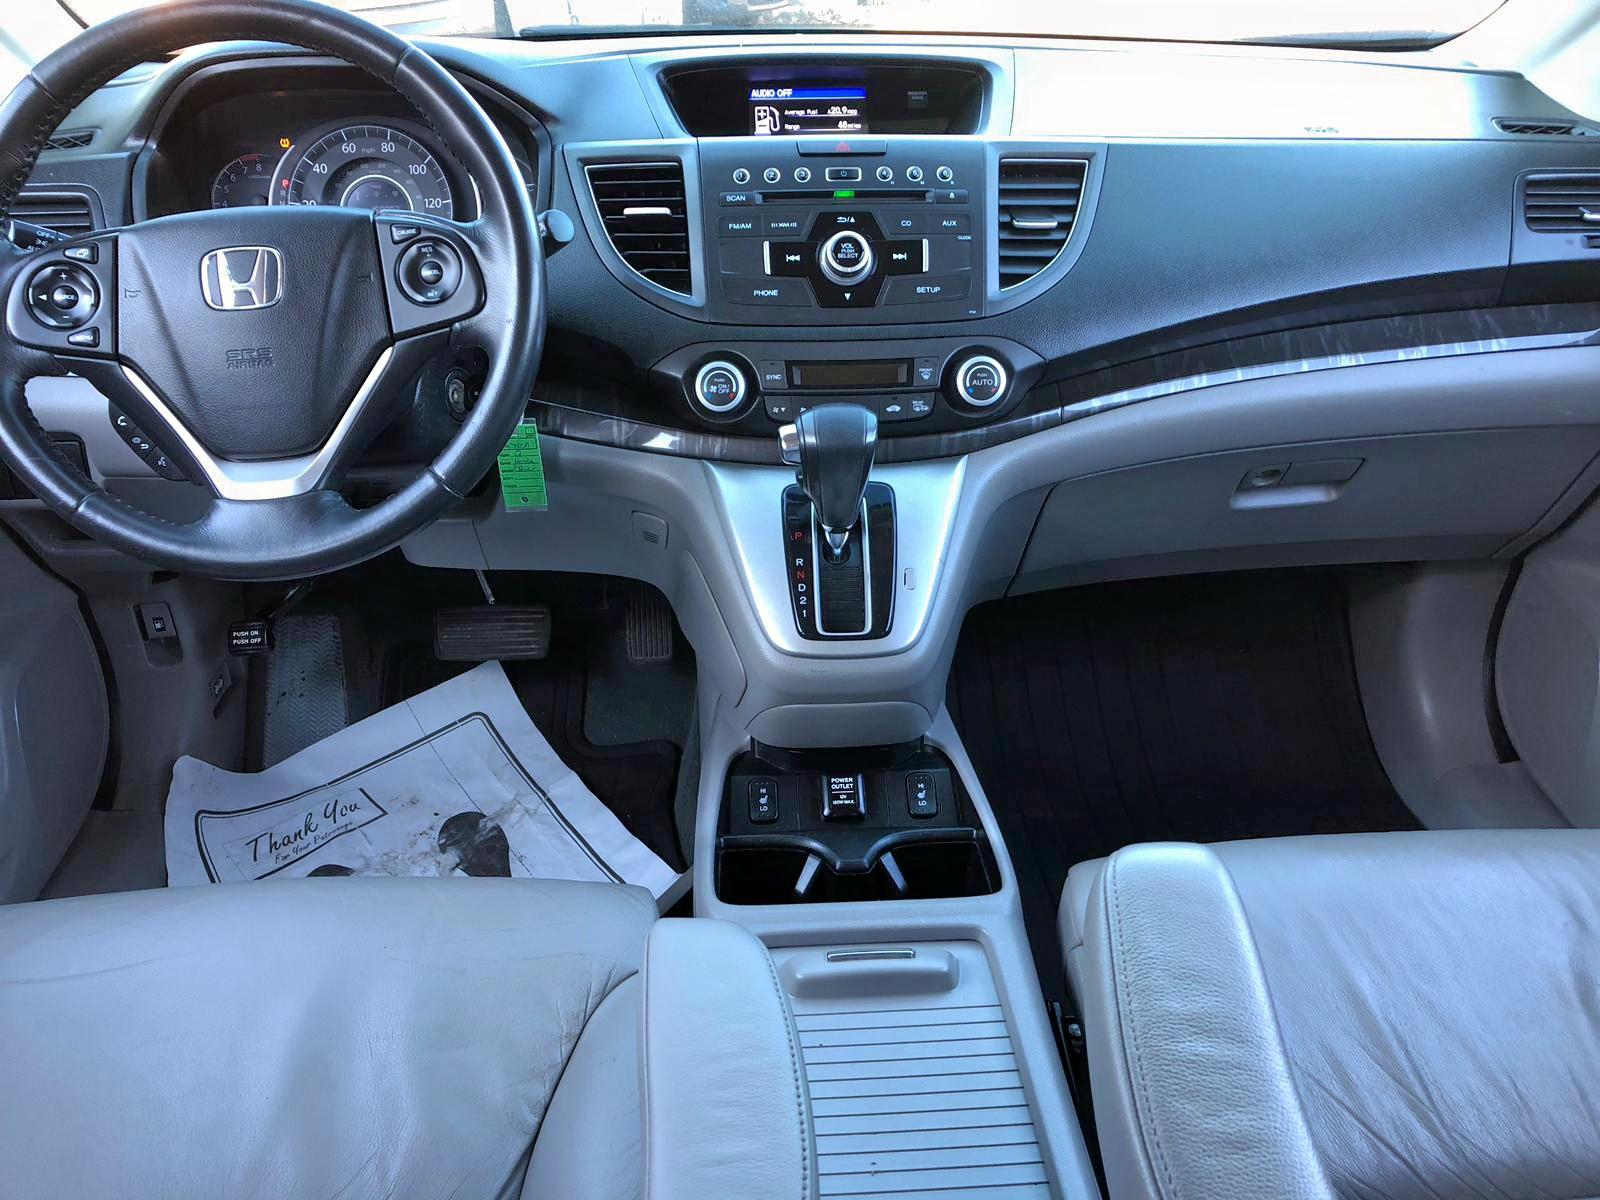 2HKRM4H73CH626699 - 2012 Honda Cr-V Exl 2.4L